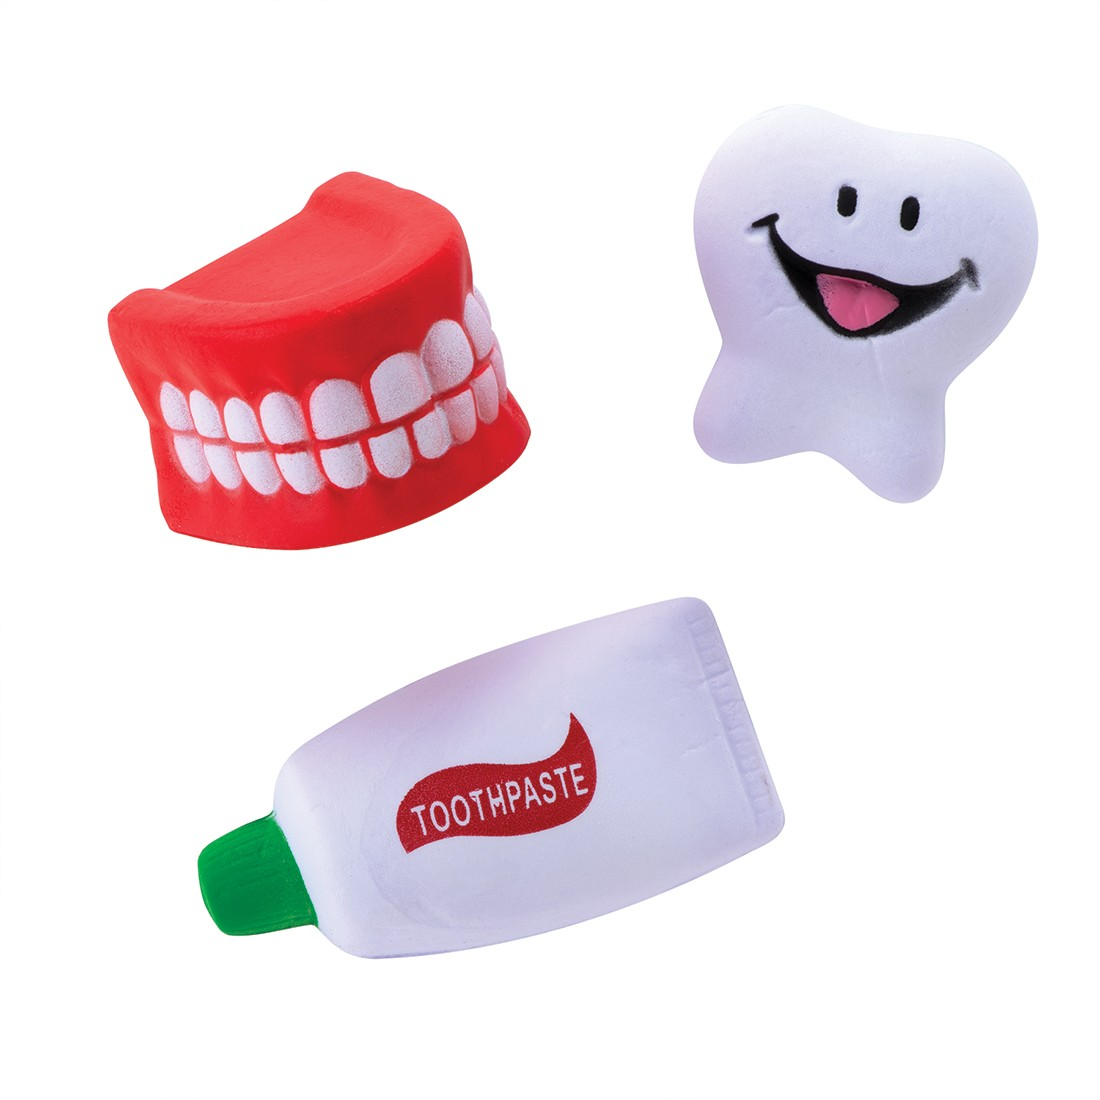 Squishie Dental Items [image]